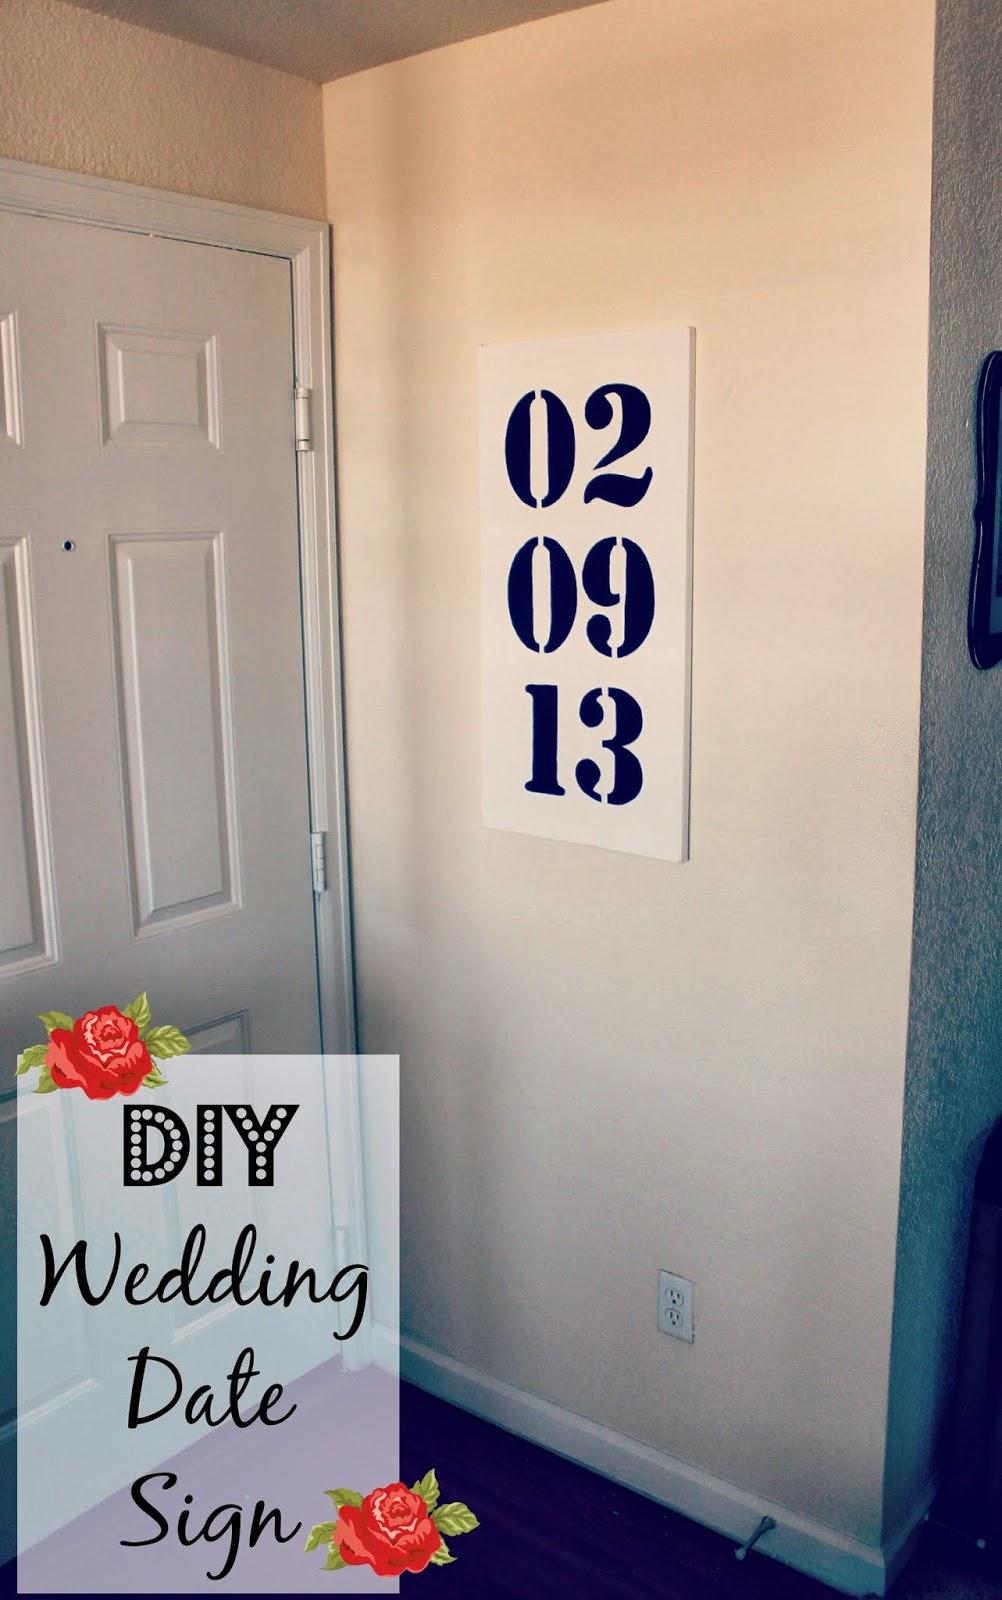 Wedding date sign in Australia